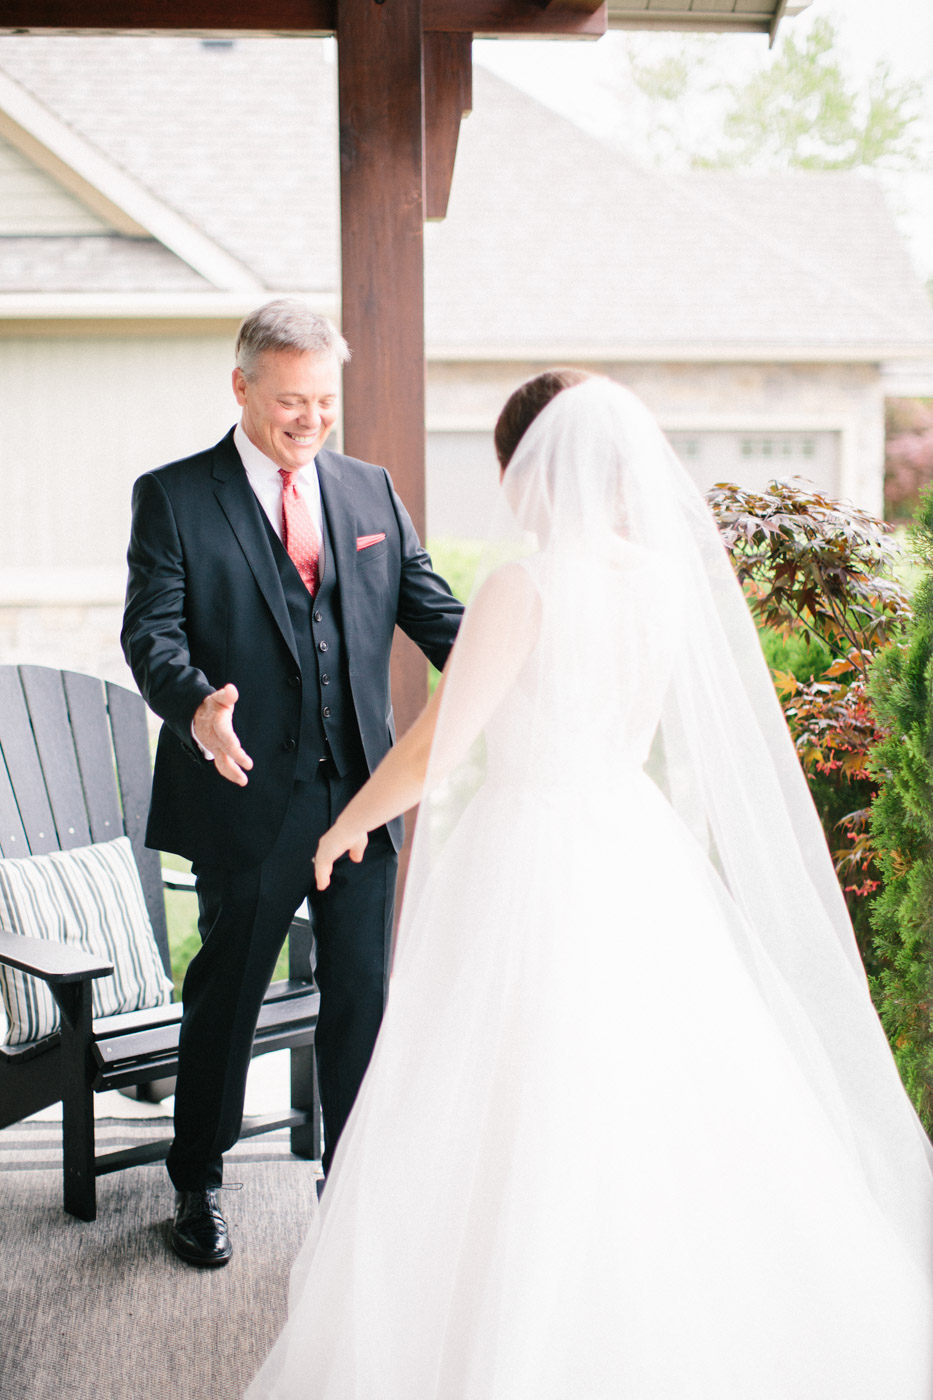 toronto_fine_art_wedding_photographer-1.jpg